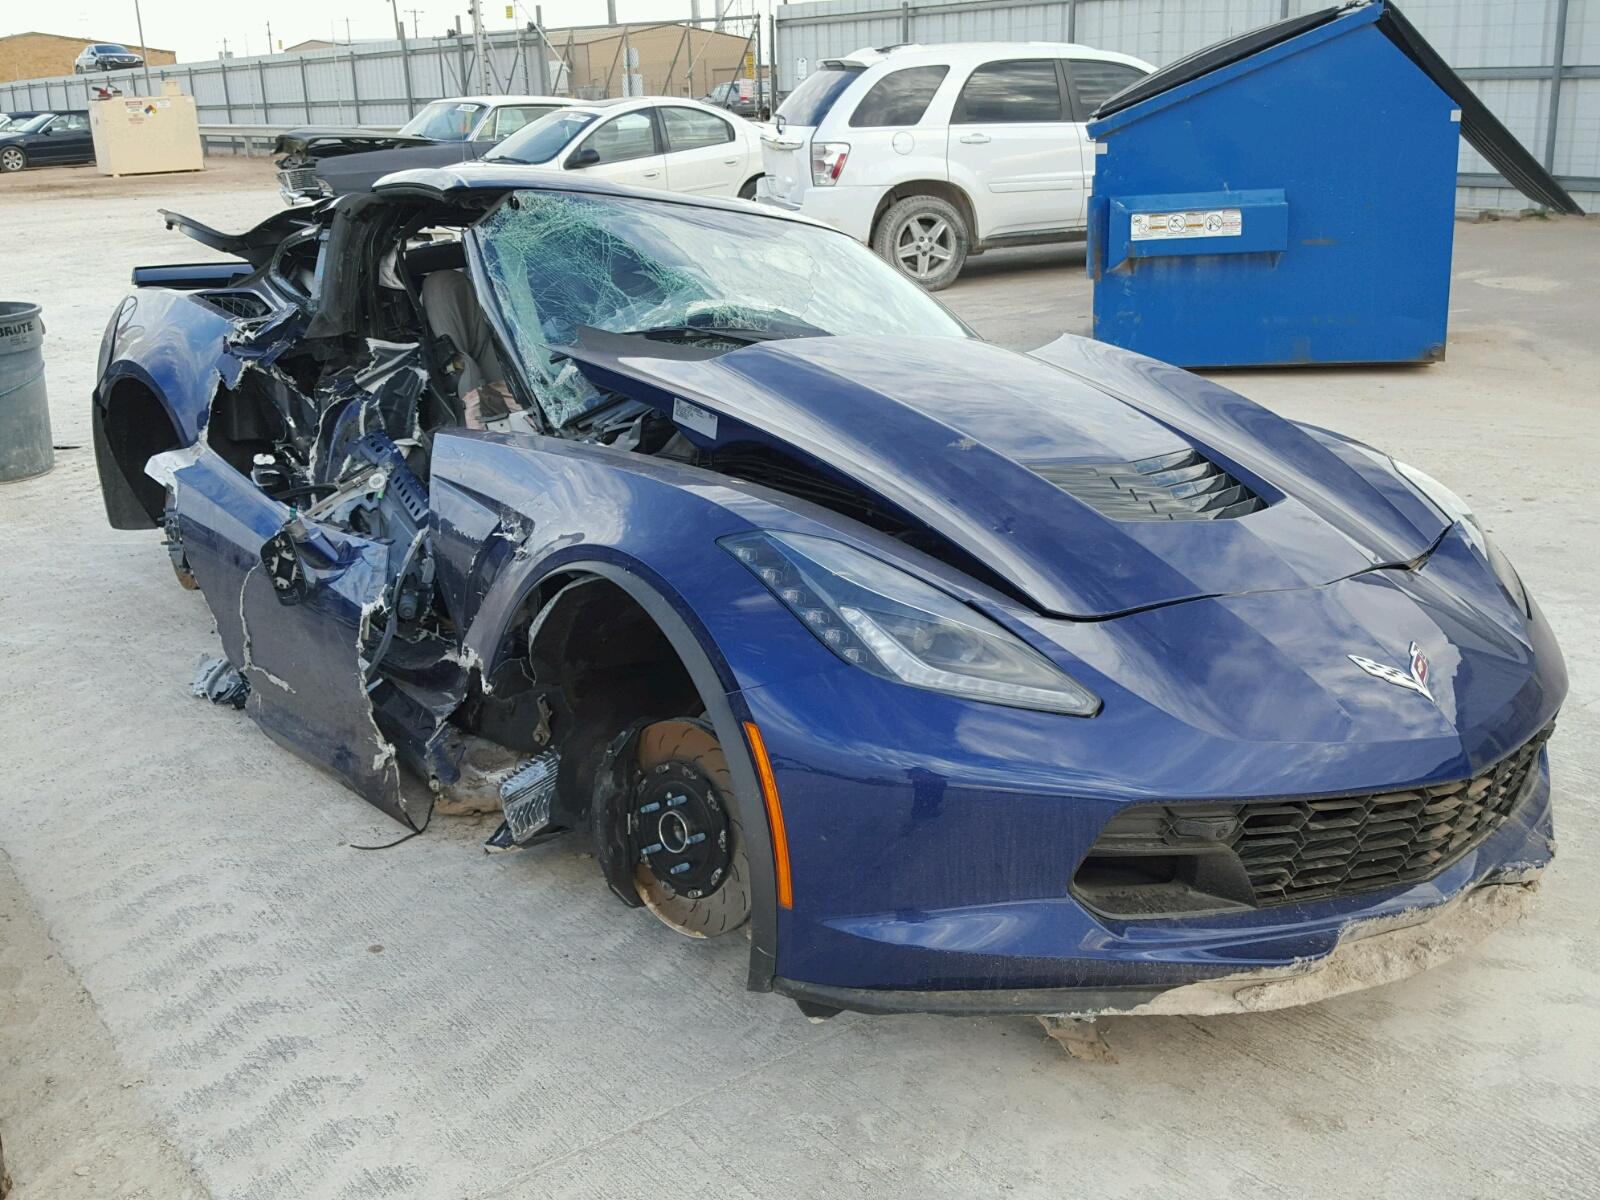 Salvaged CHEVROLET CORVETTE for Auction - AutoBidMaster